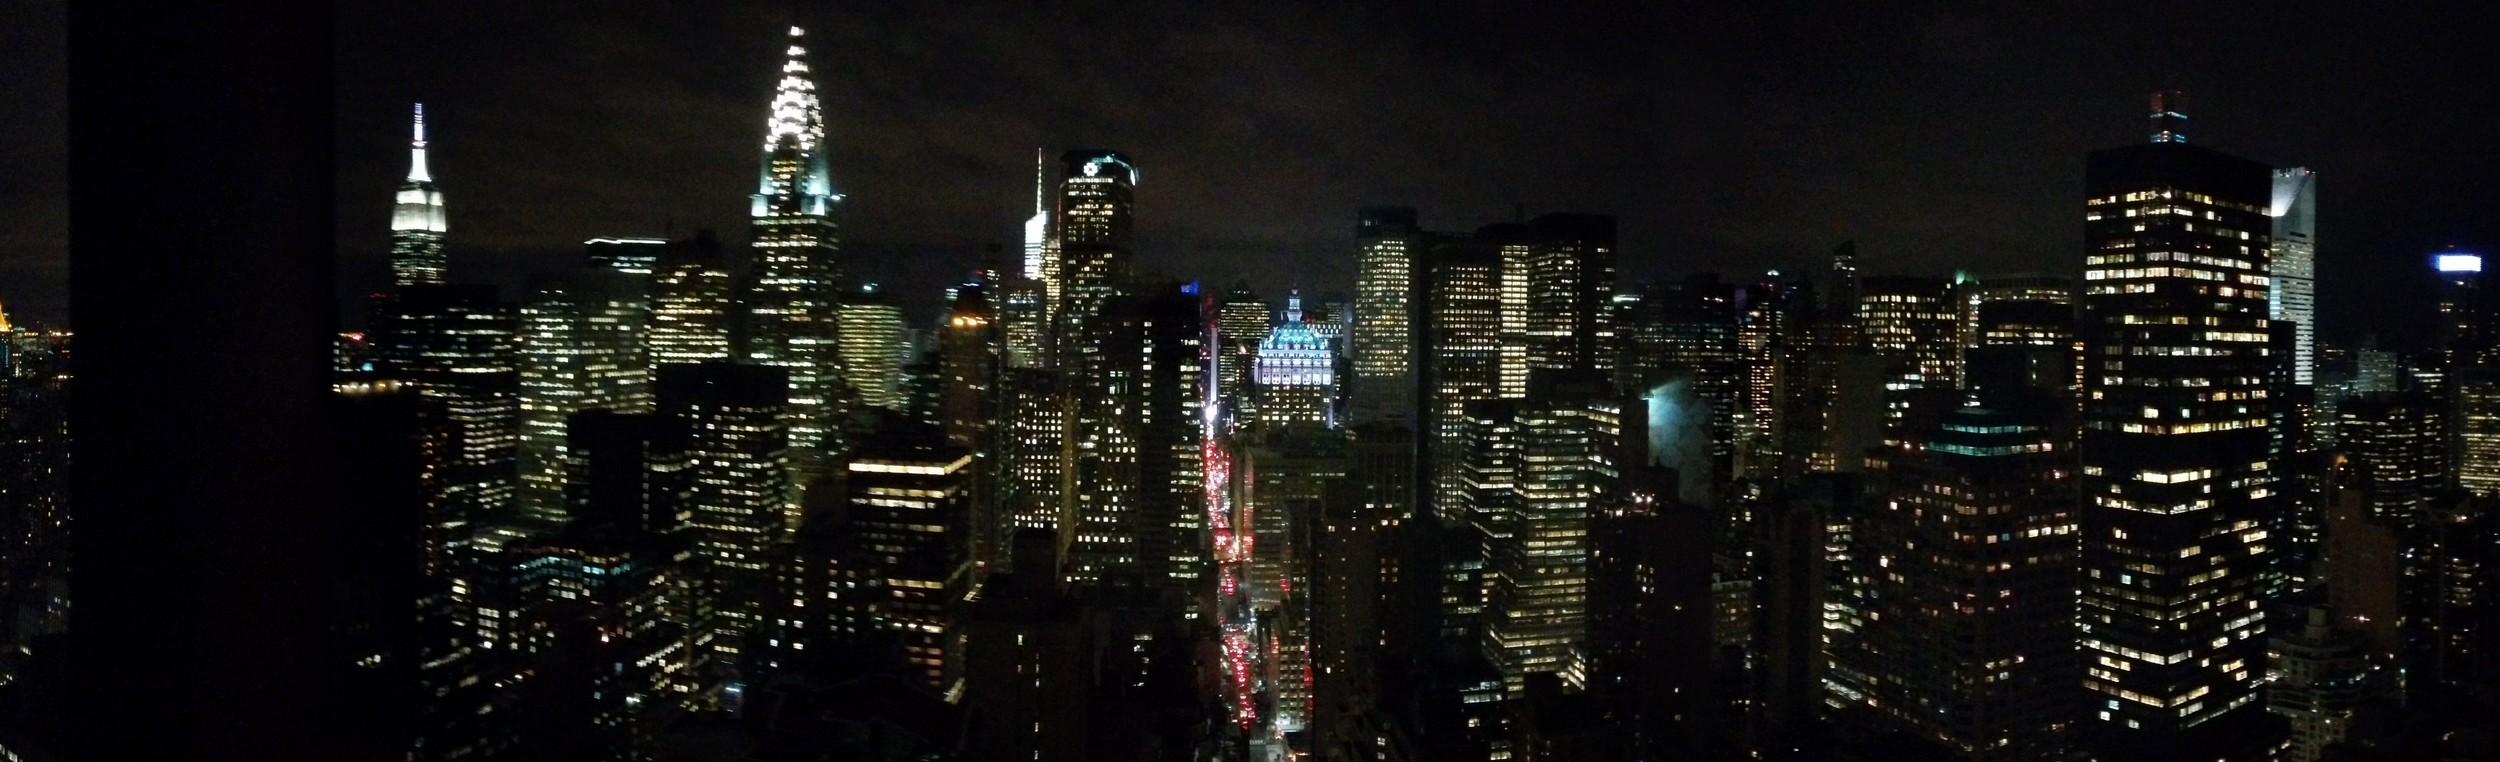 New York, New York: May 2009